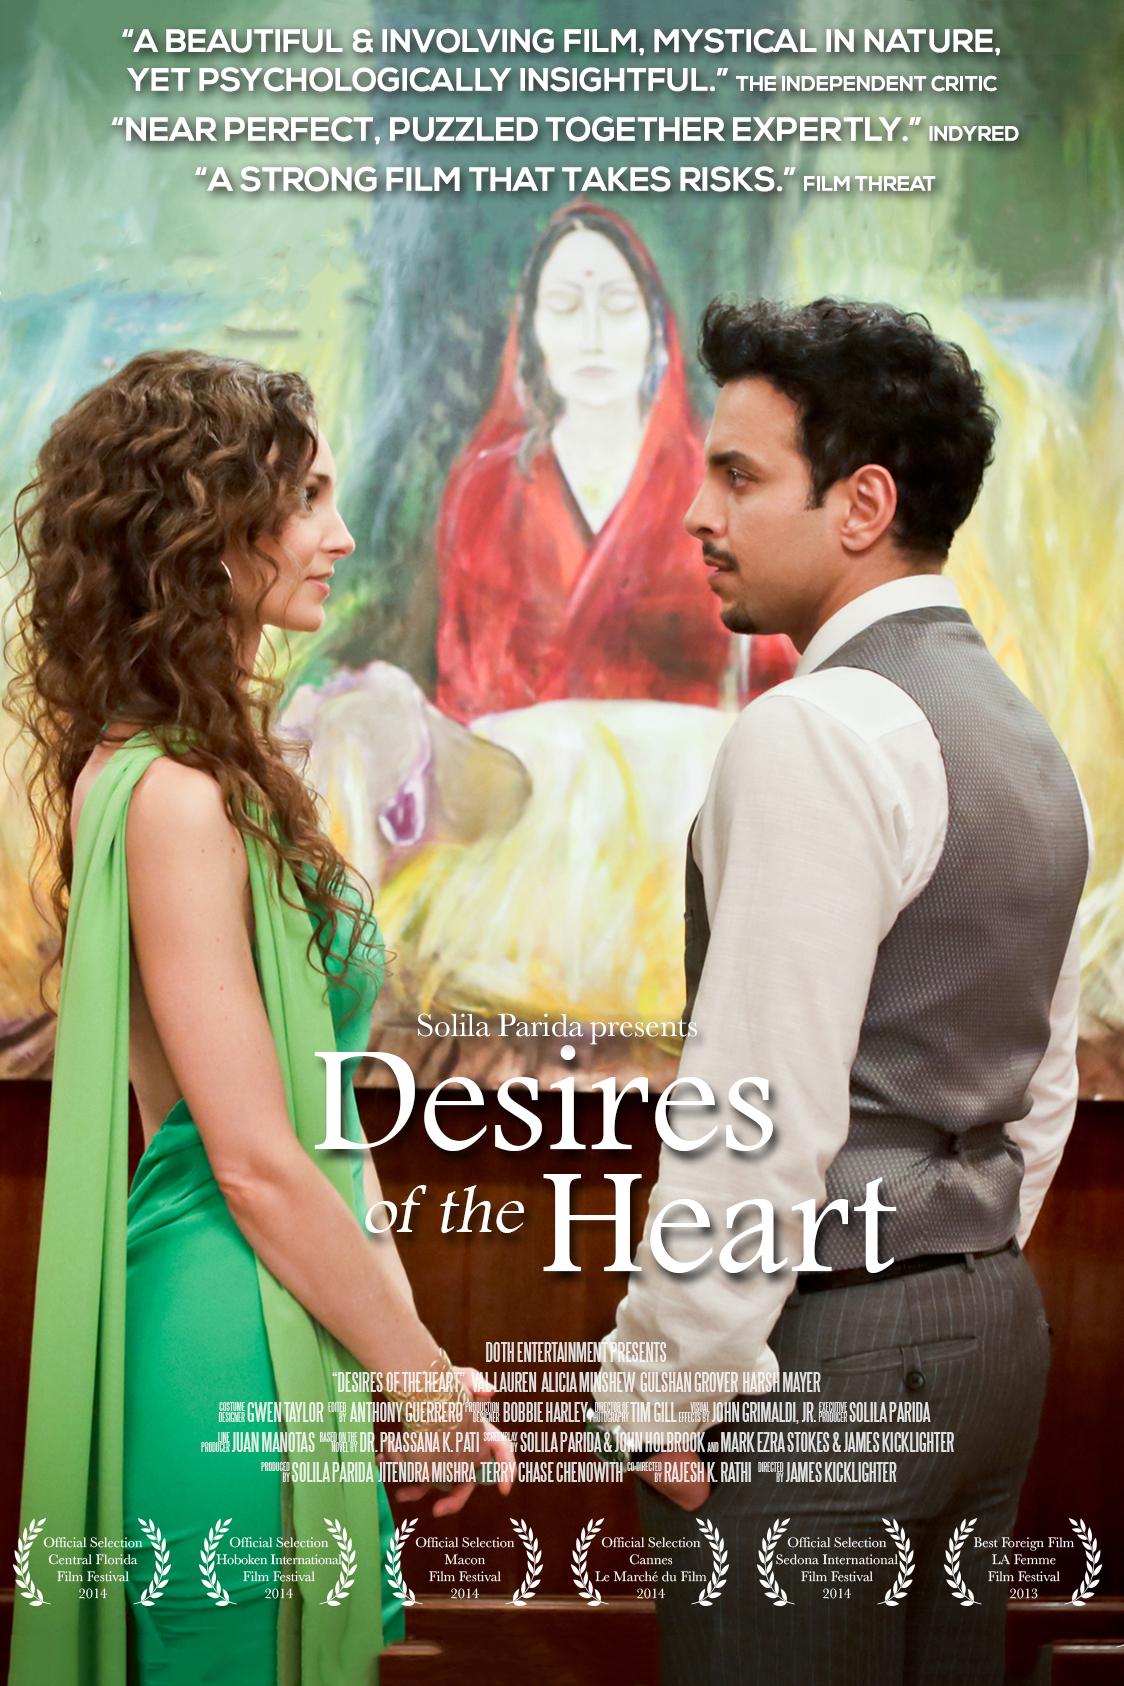 Desires_Of_The_Heart_James_Kicklighter_Film